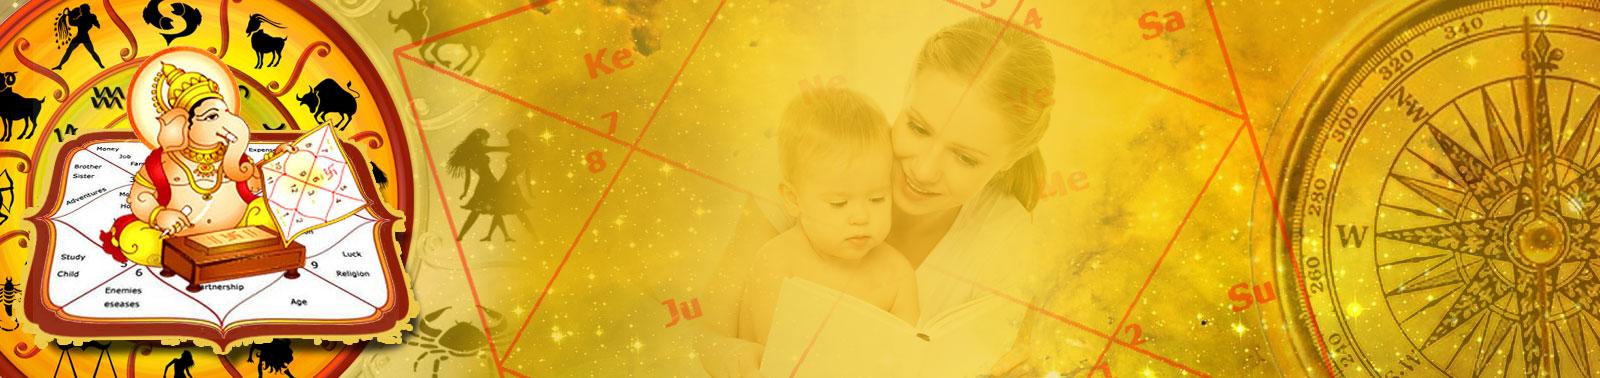 Premium Horoscopes banner